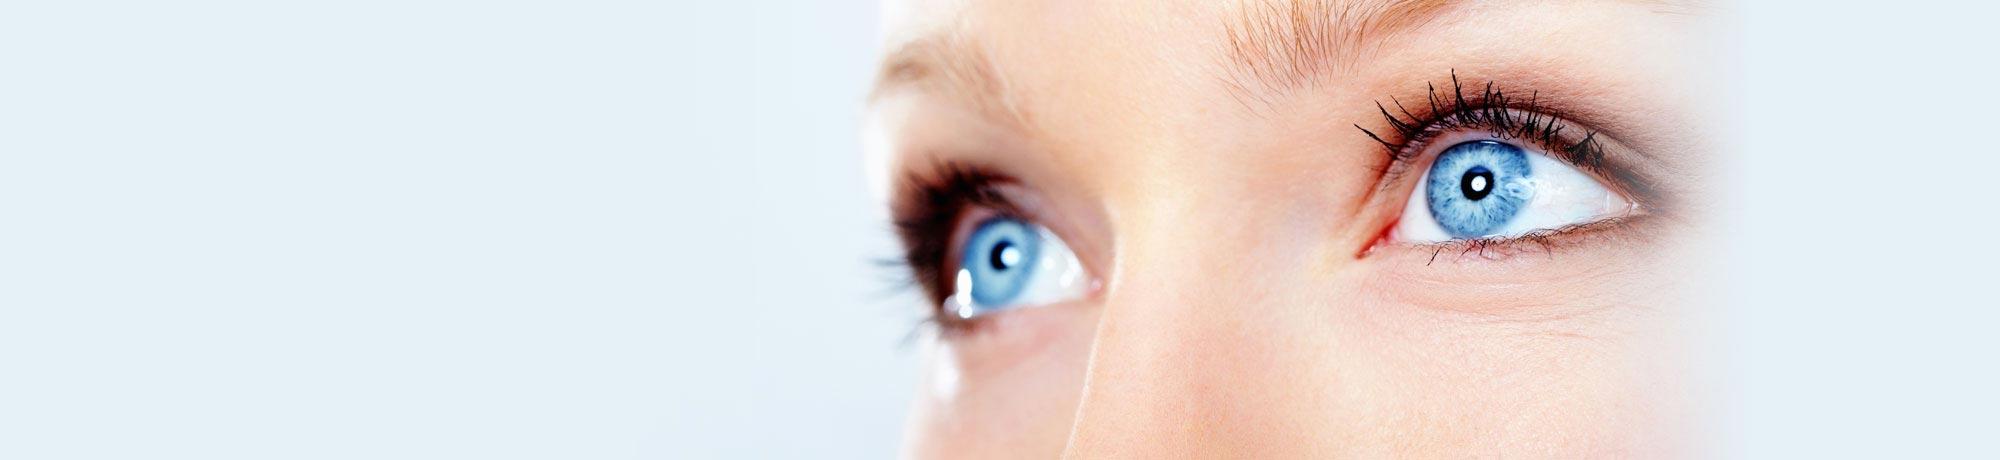 a49142fd1f5 Eye surgery and treatments